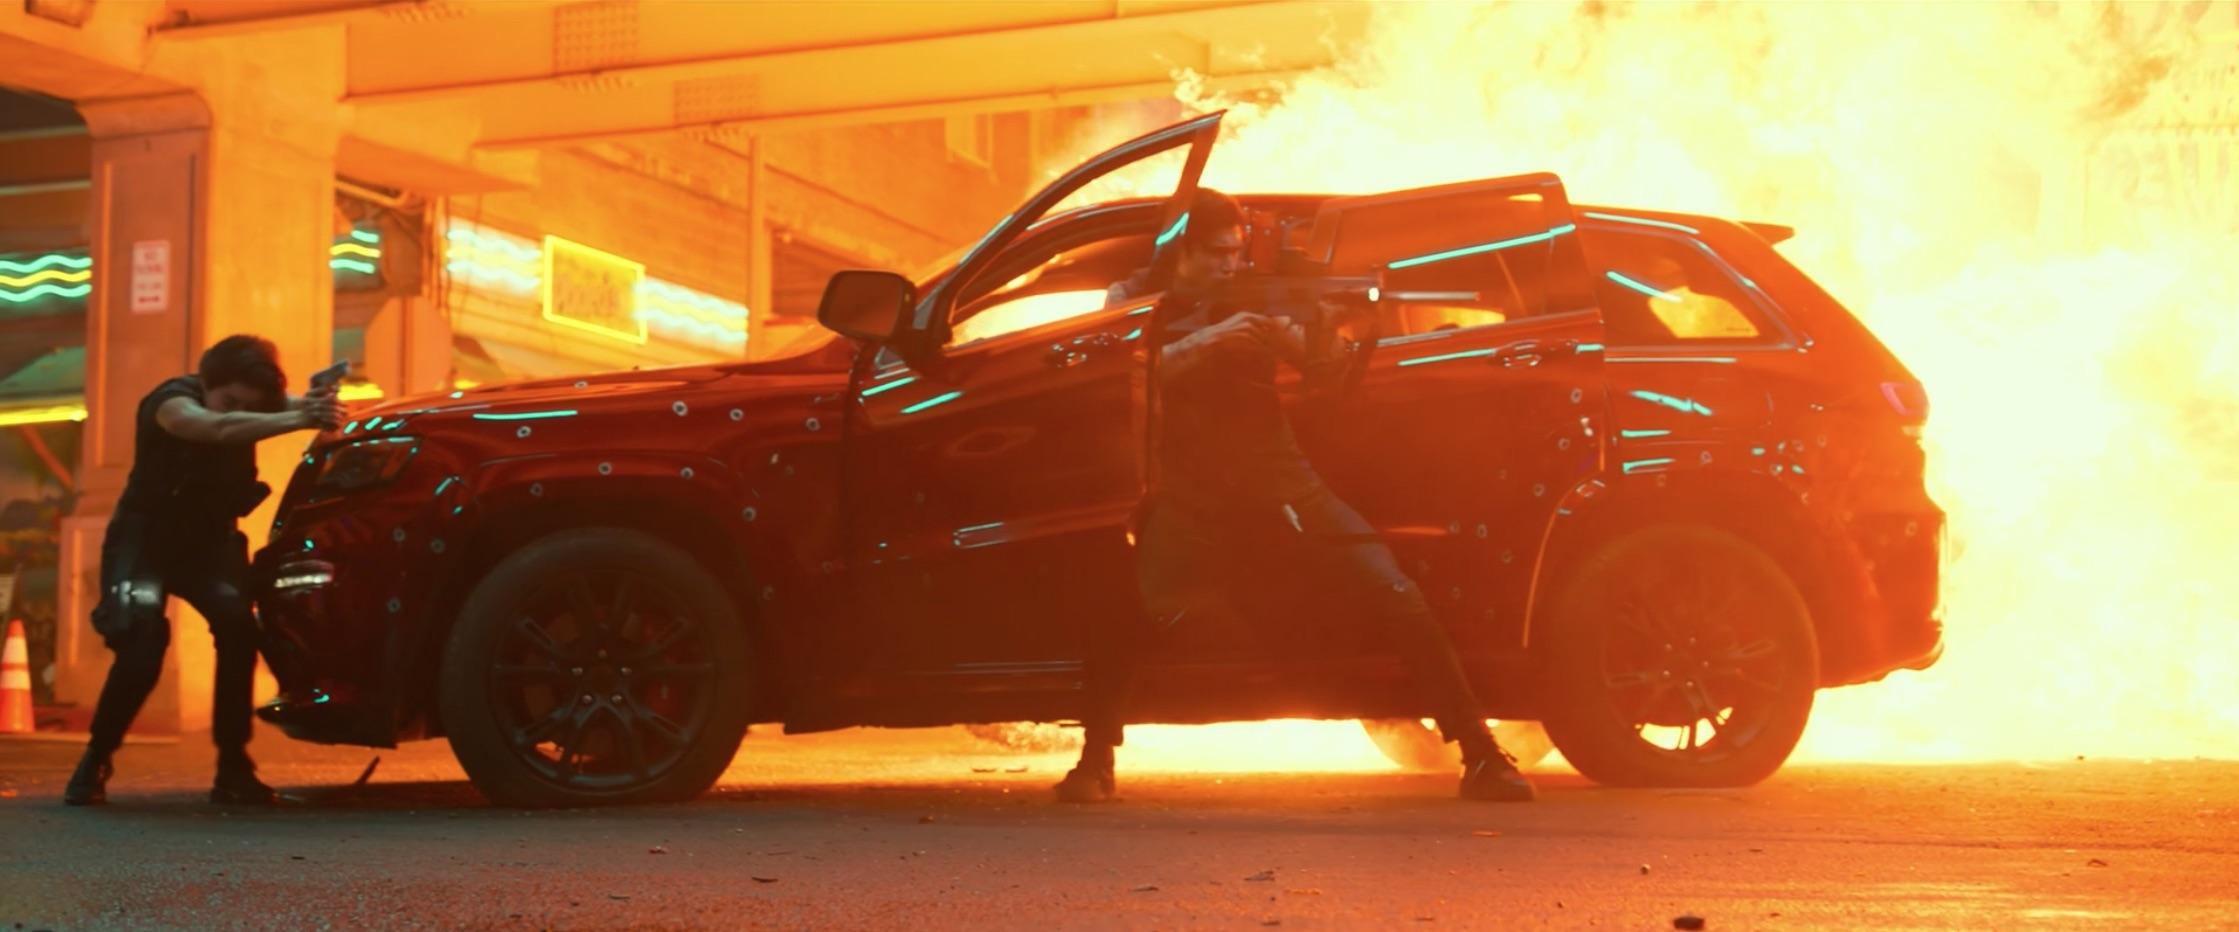 Bad Boys For Life gunman and jeep trackhawk near explosion